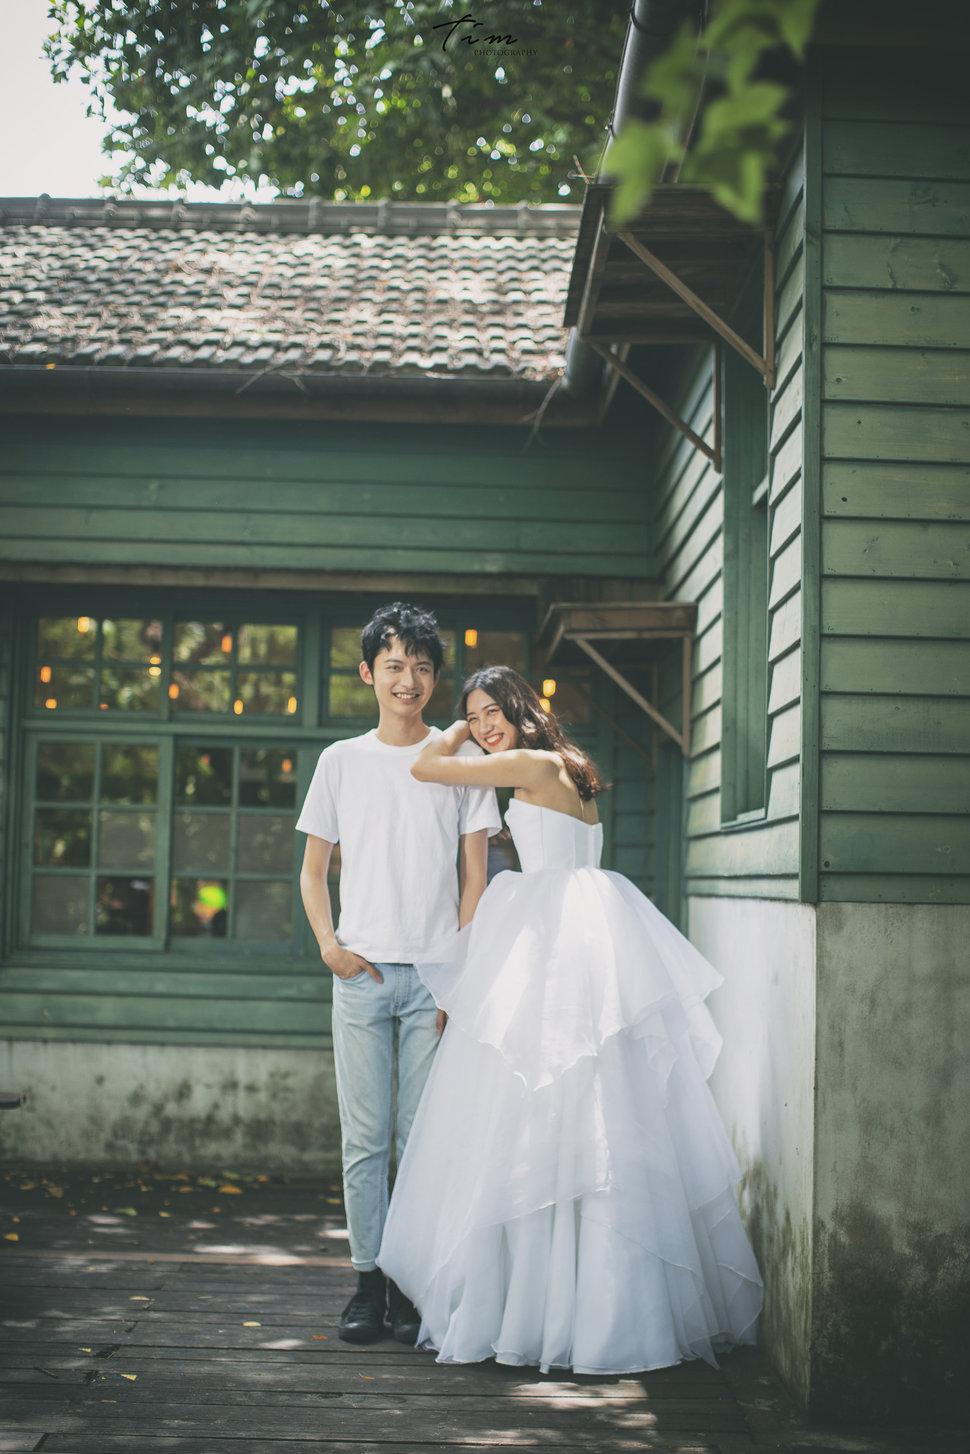 TIM_3191 - 提姆 Tim photography《結婚吧》